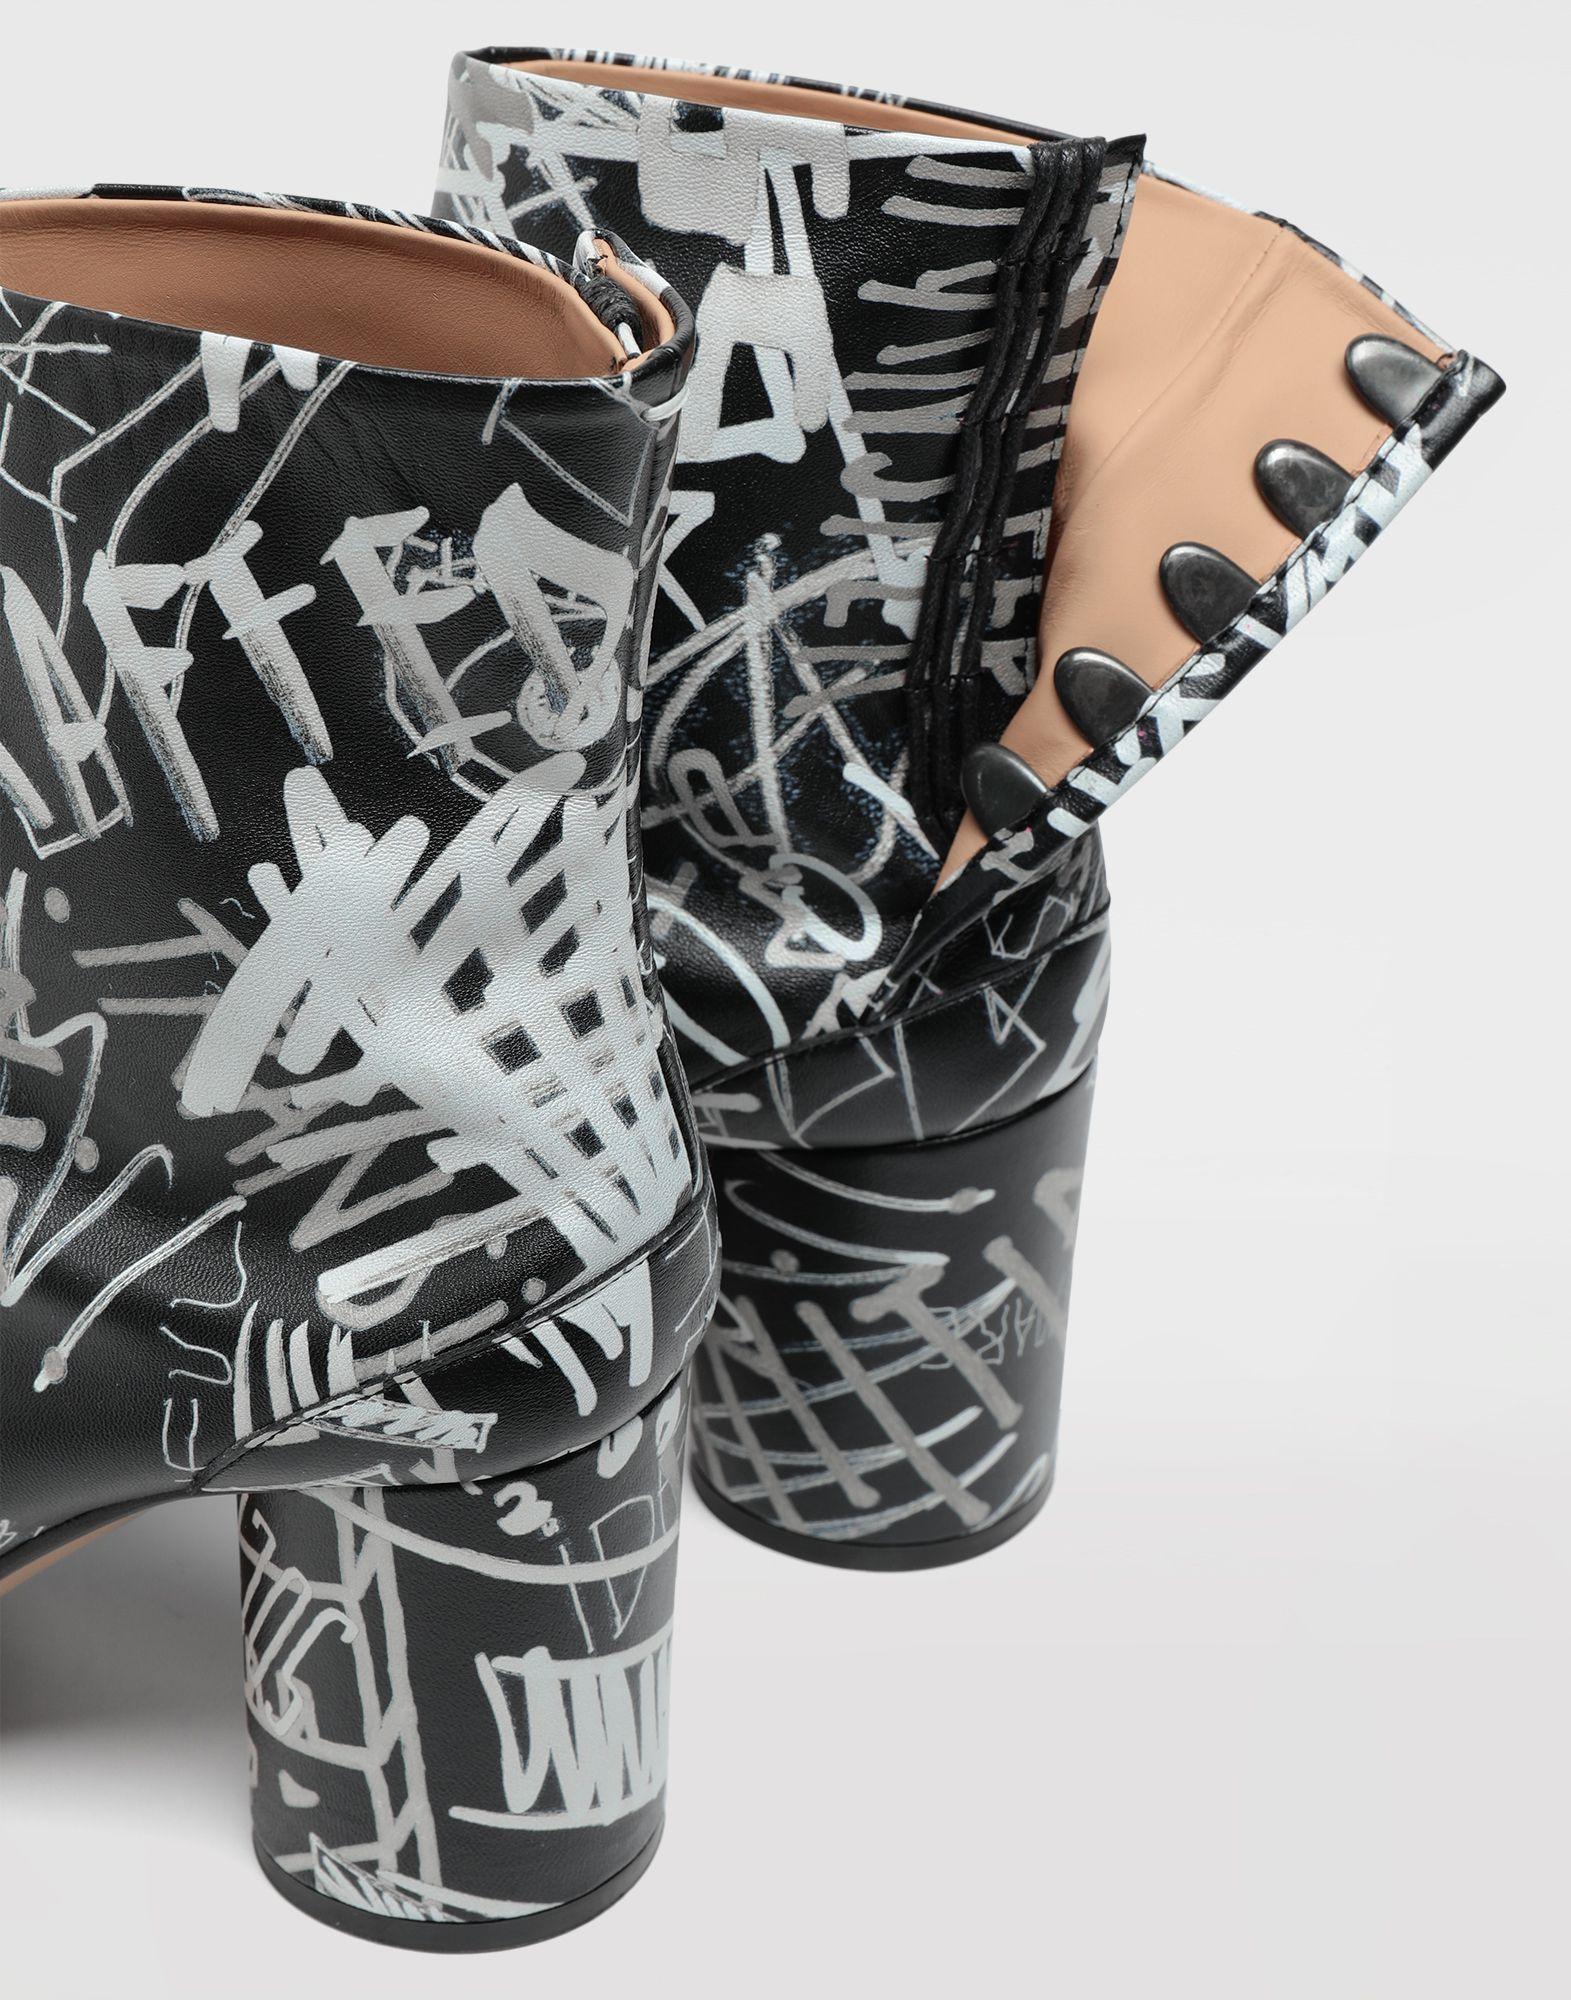 MAISON MARGIELA Graffiti Tabi boots Tabi boots & Ankle boots Woman b